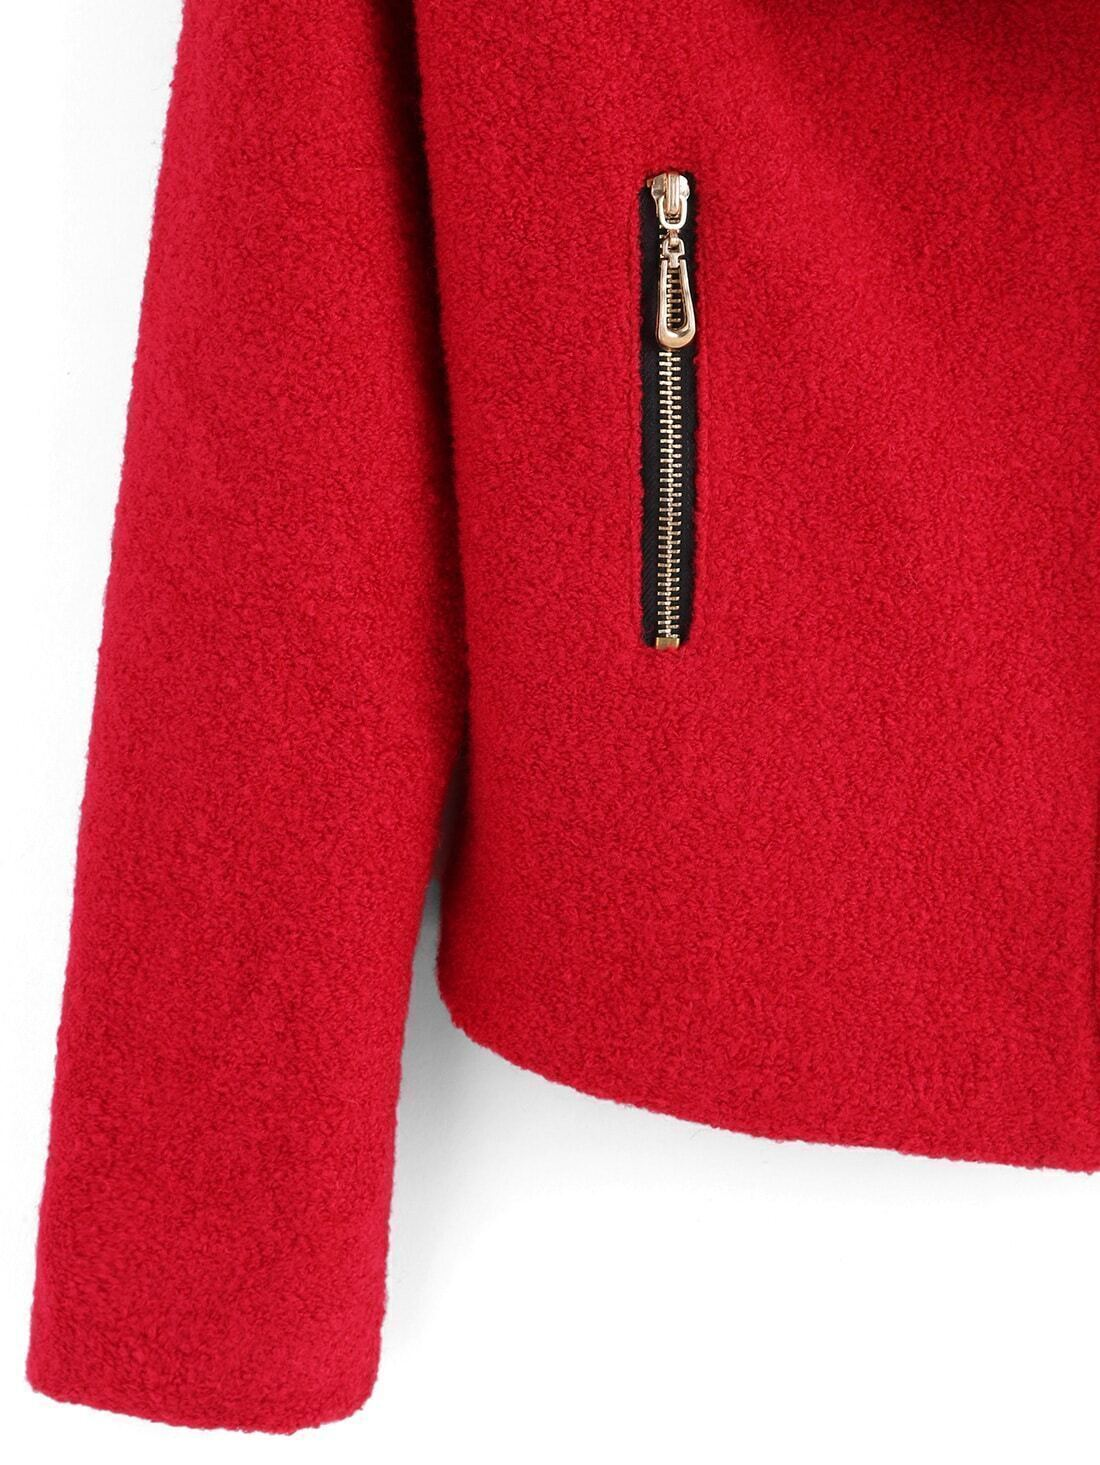 kurzer wollmantel revers mit rei verschluss rot german. Black Bedroom Furniture Sets. Home Design Ideas